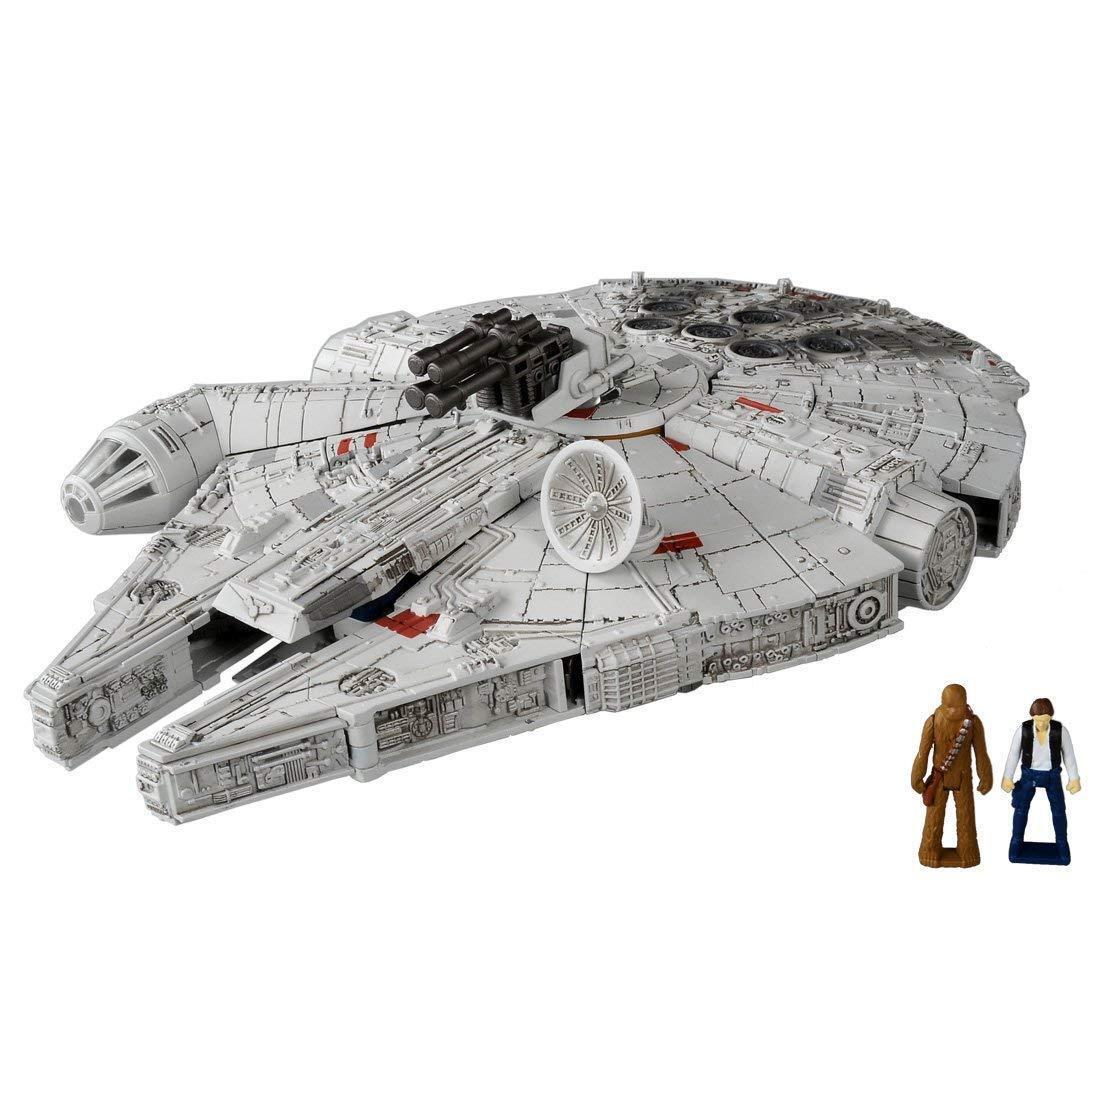 MISB in USA - Takara Star Wars Transformers 02 Millennium Falcon Han Chewbacca